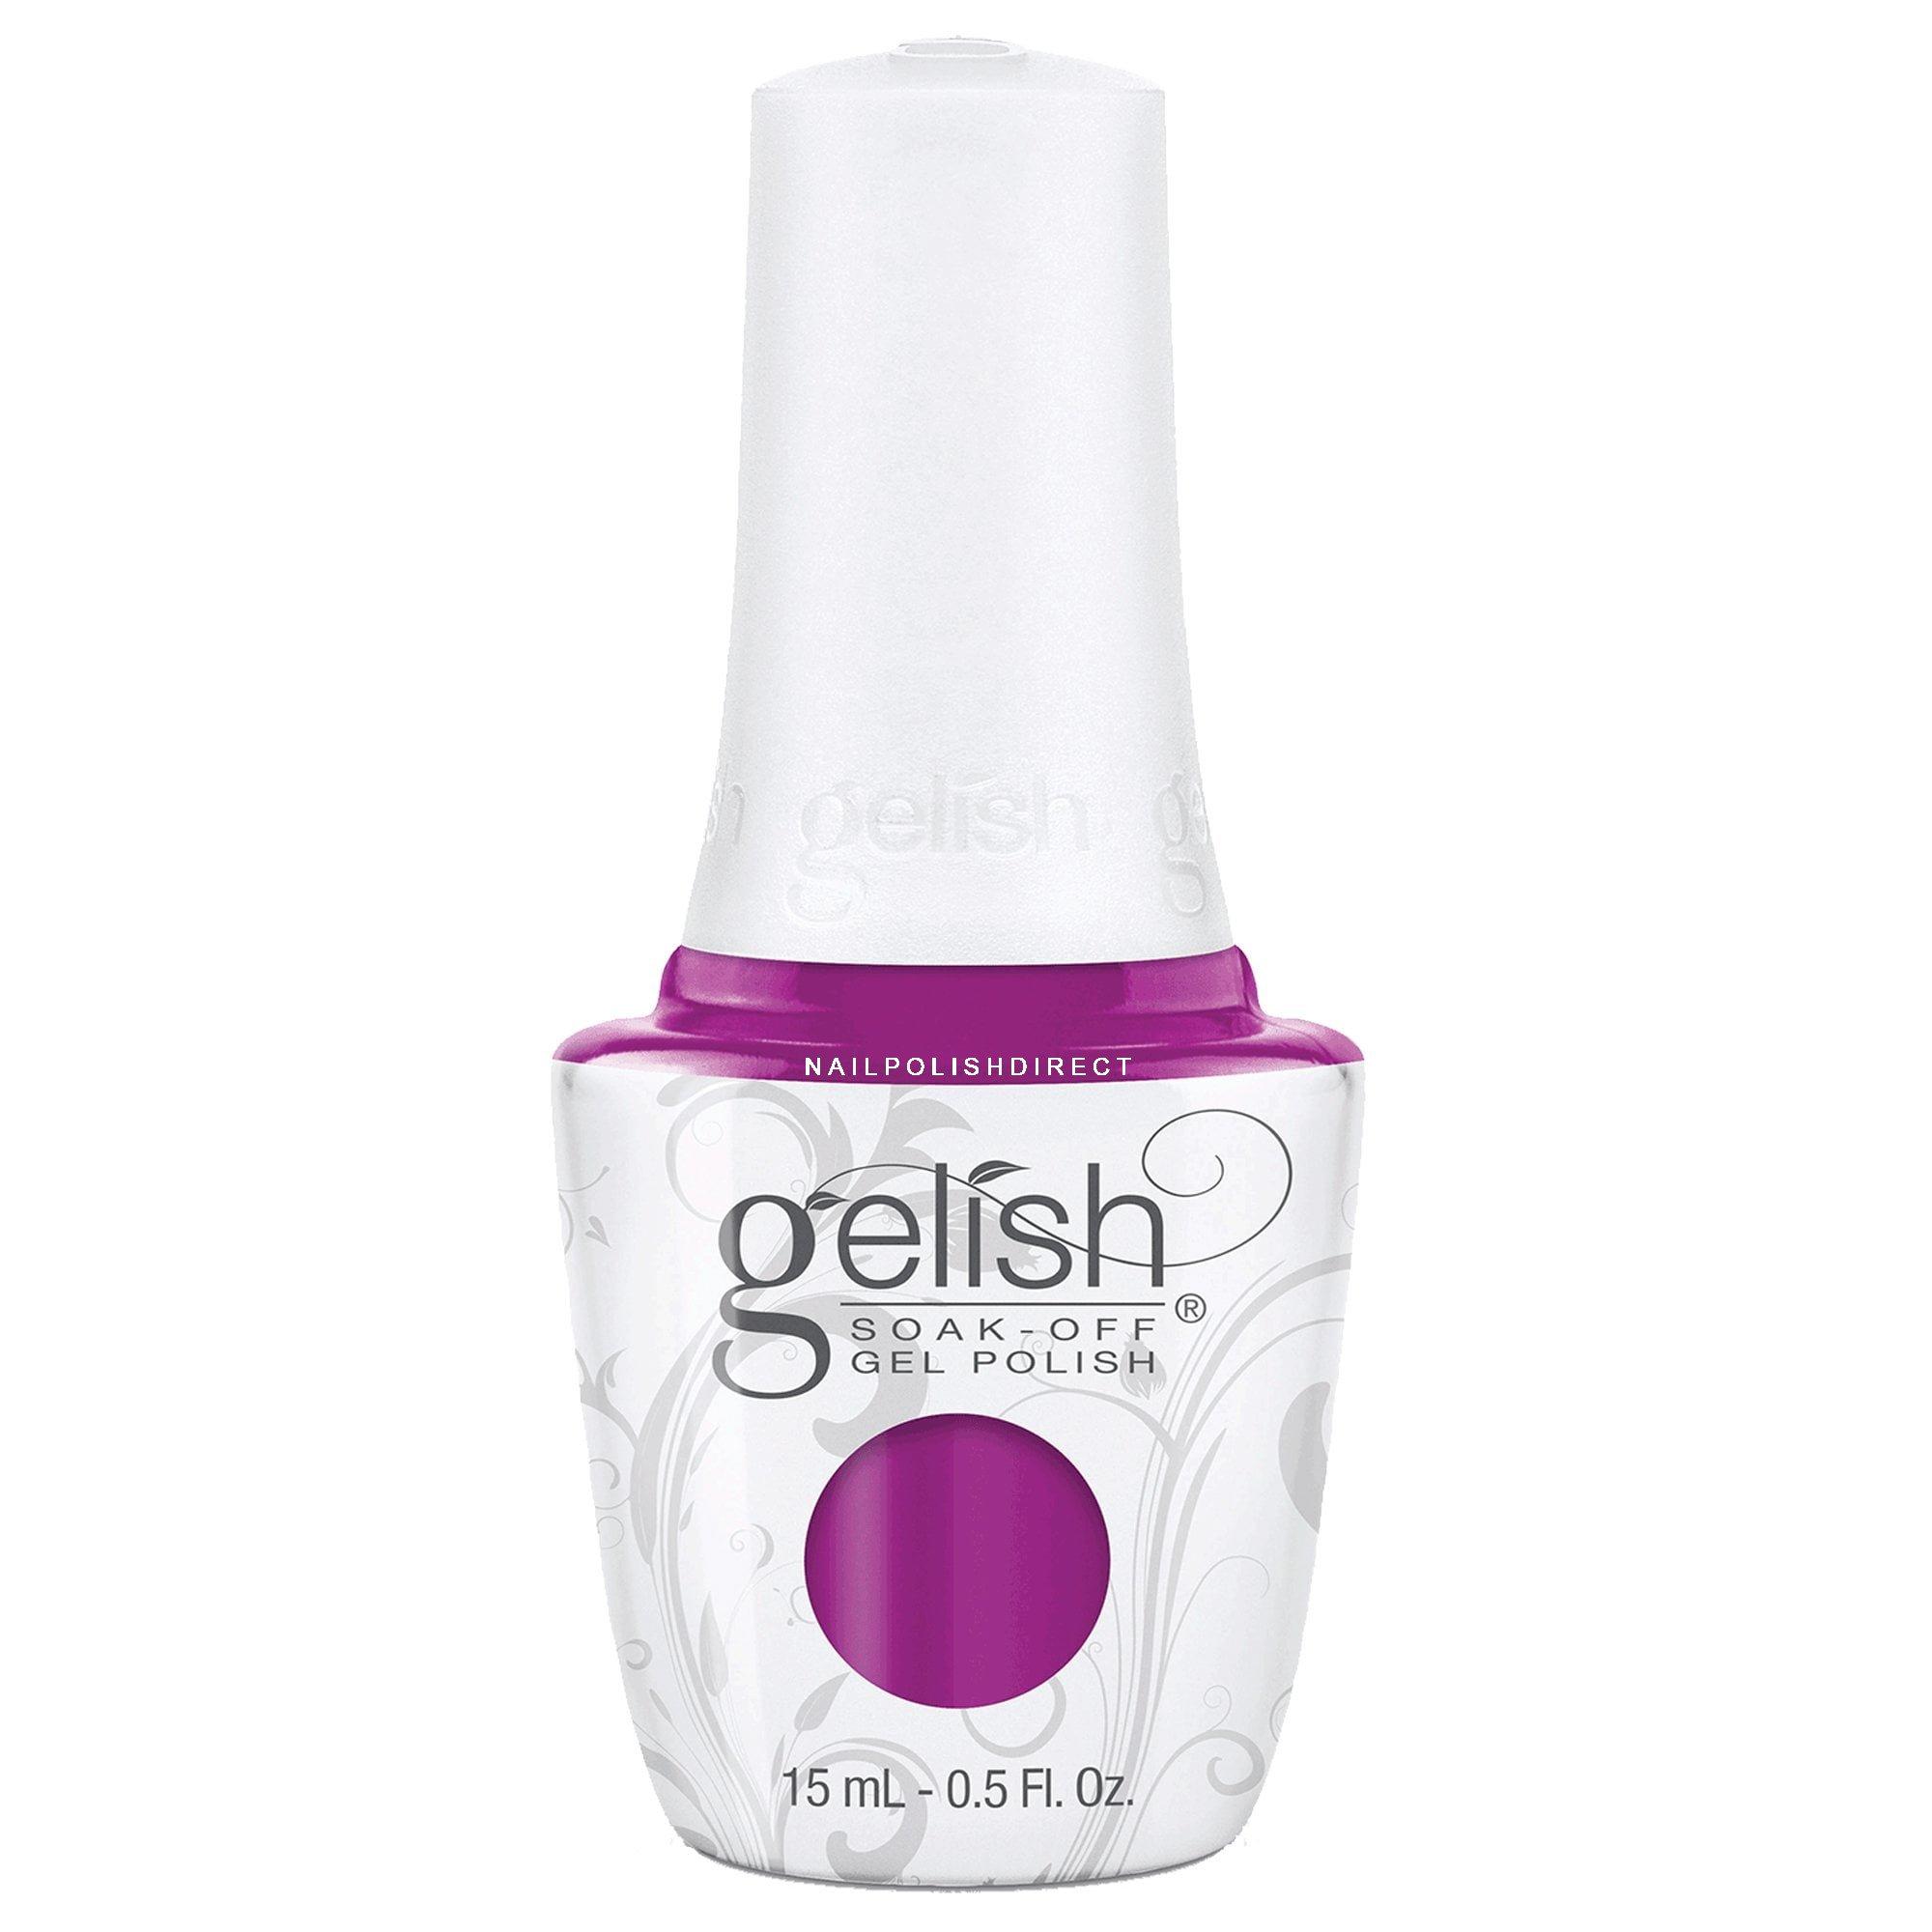 679d64ebb9 Gelish Gelish Soak-Off Gel Nail Polish - Tahiti Hottie 15ml (01620)